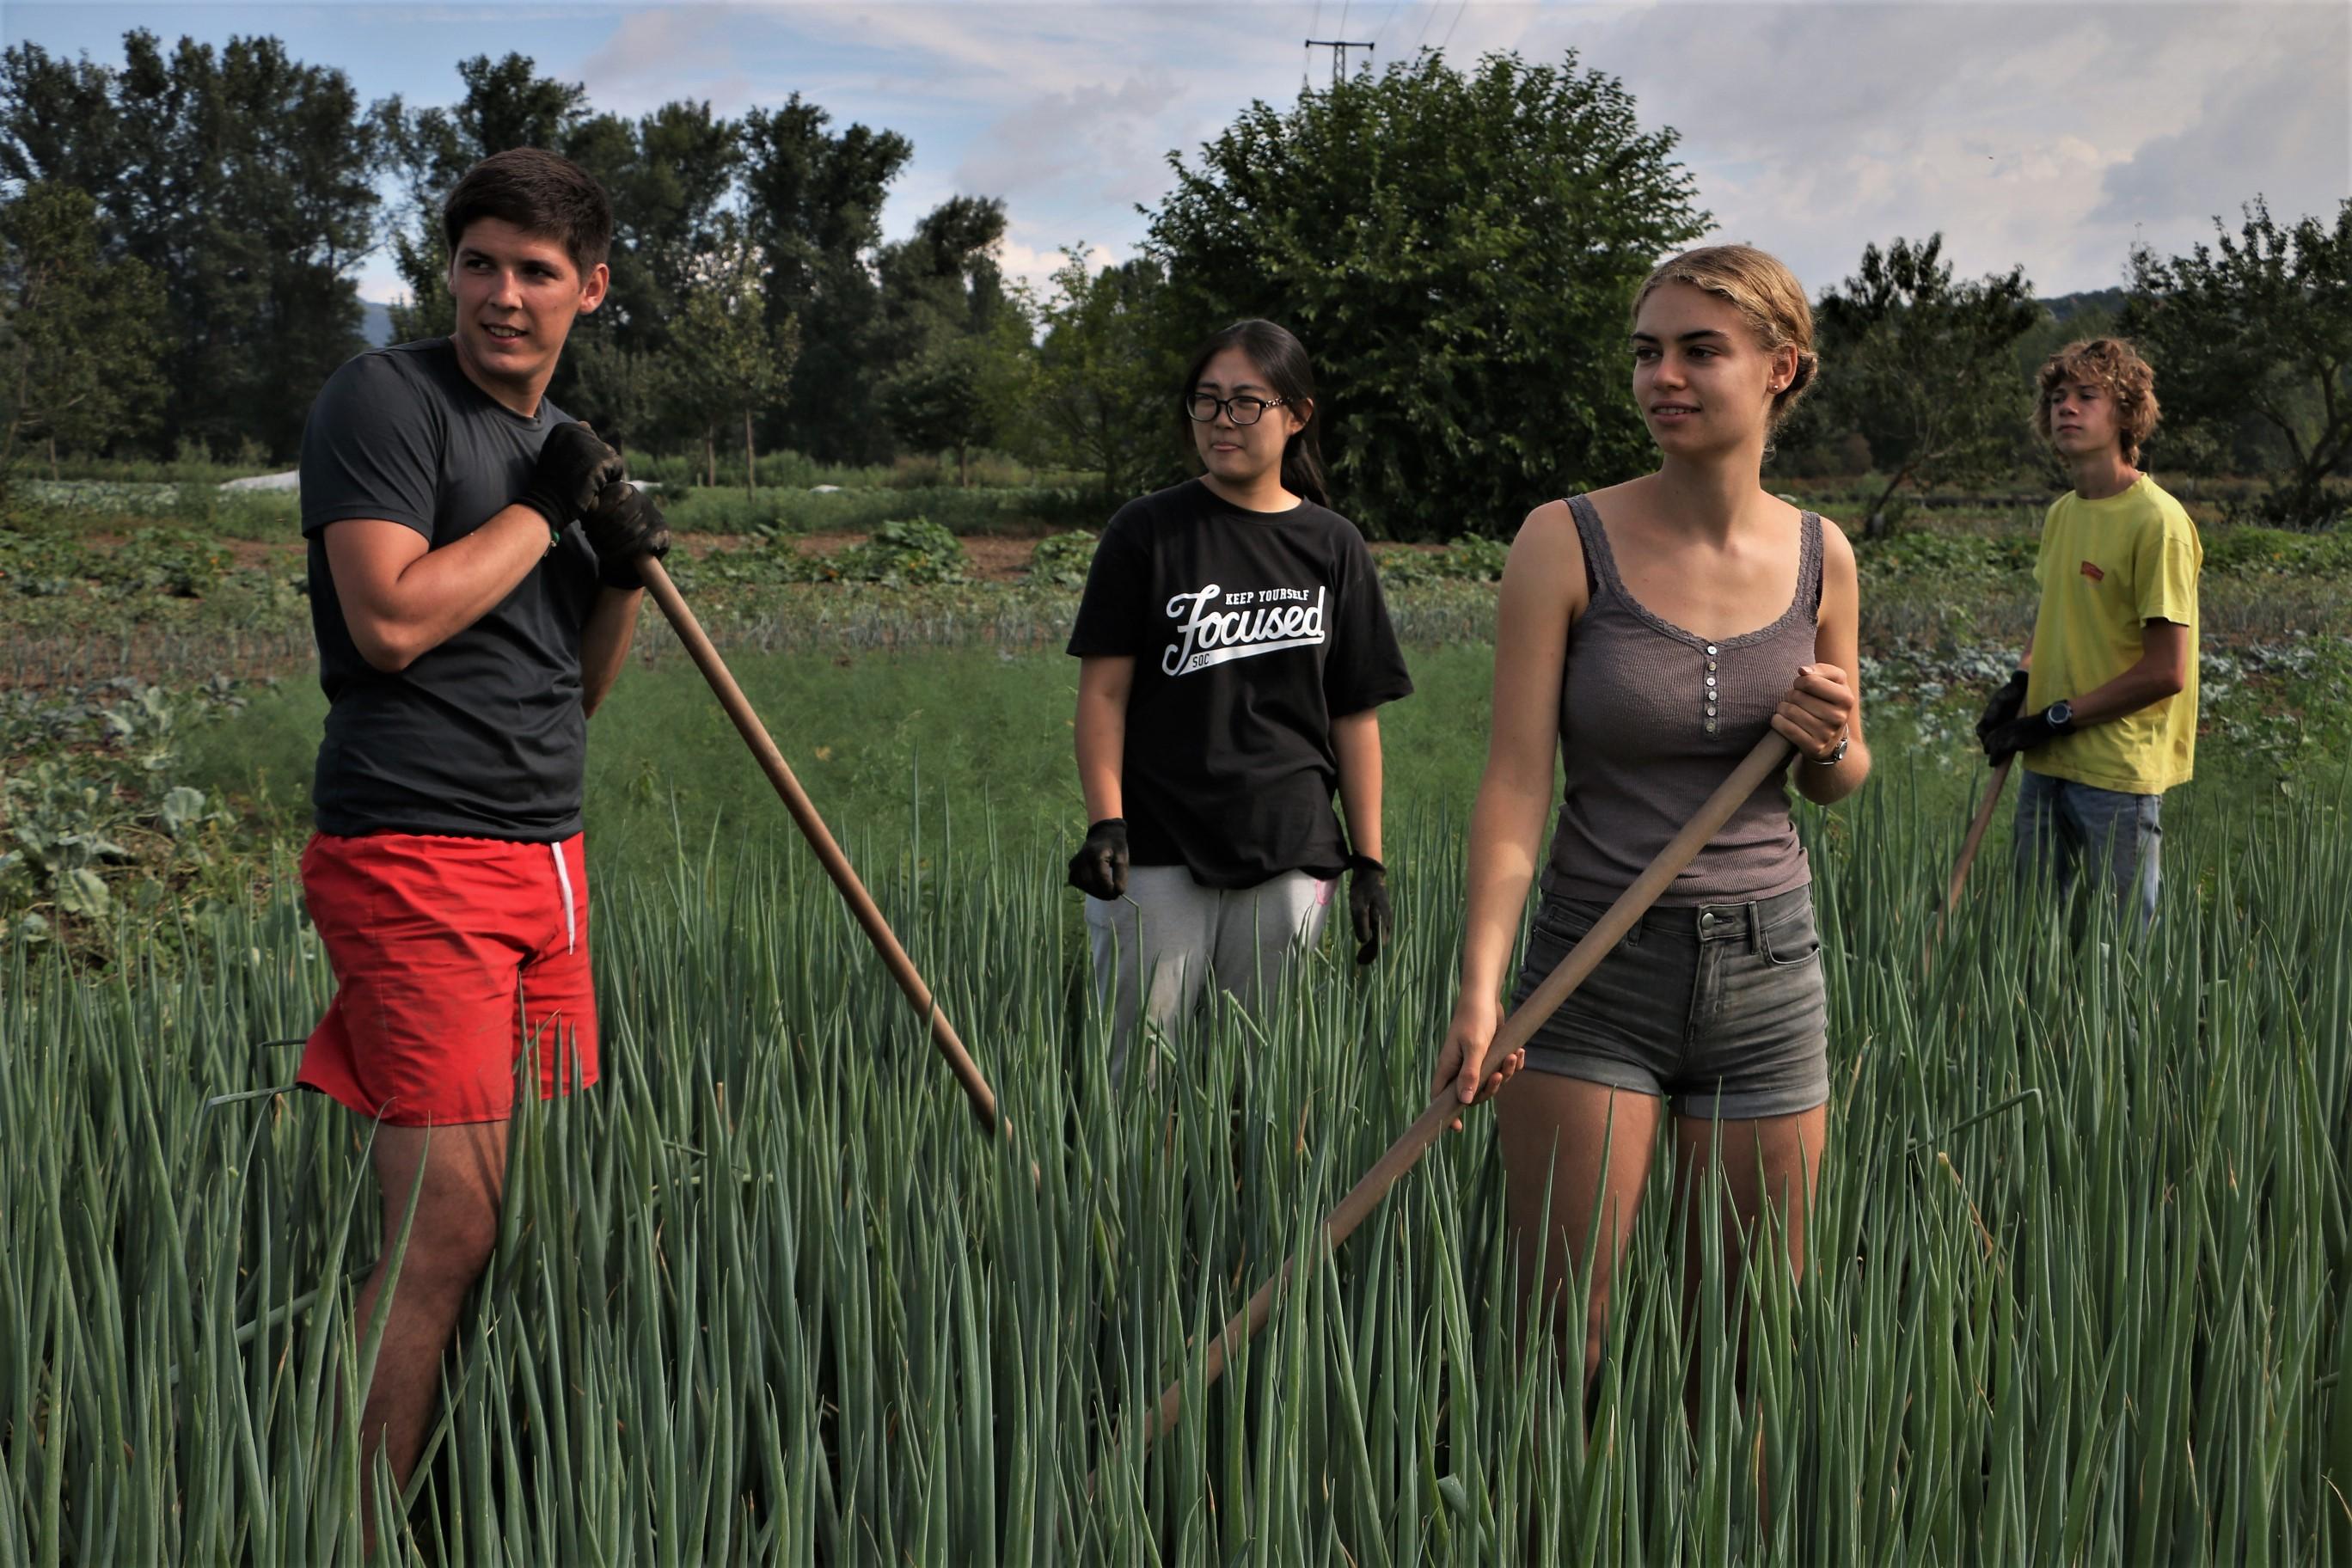 Campleaders wanted: na Plzeňsku nebo na ekofarmě